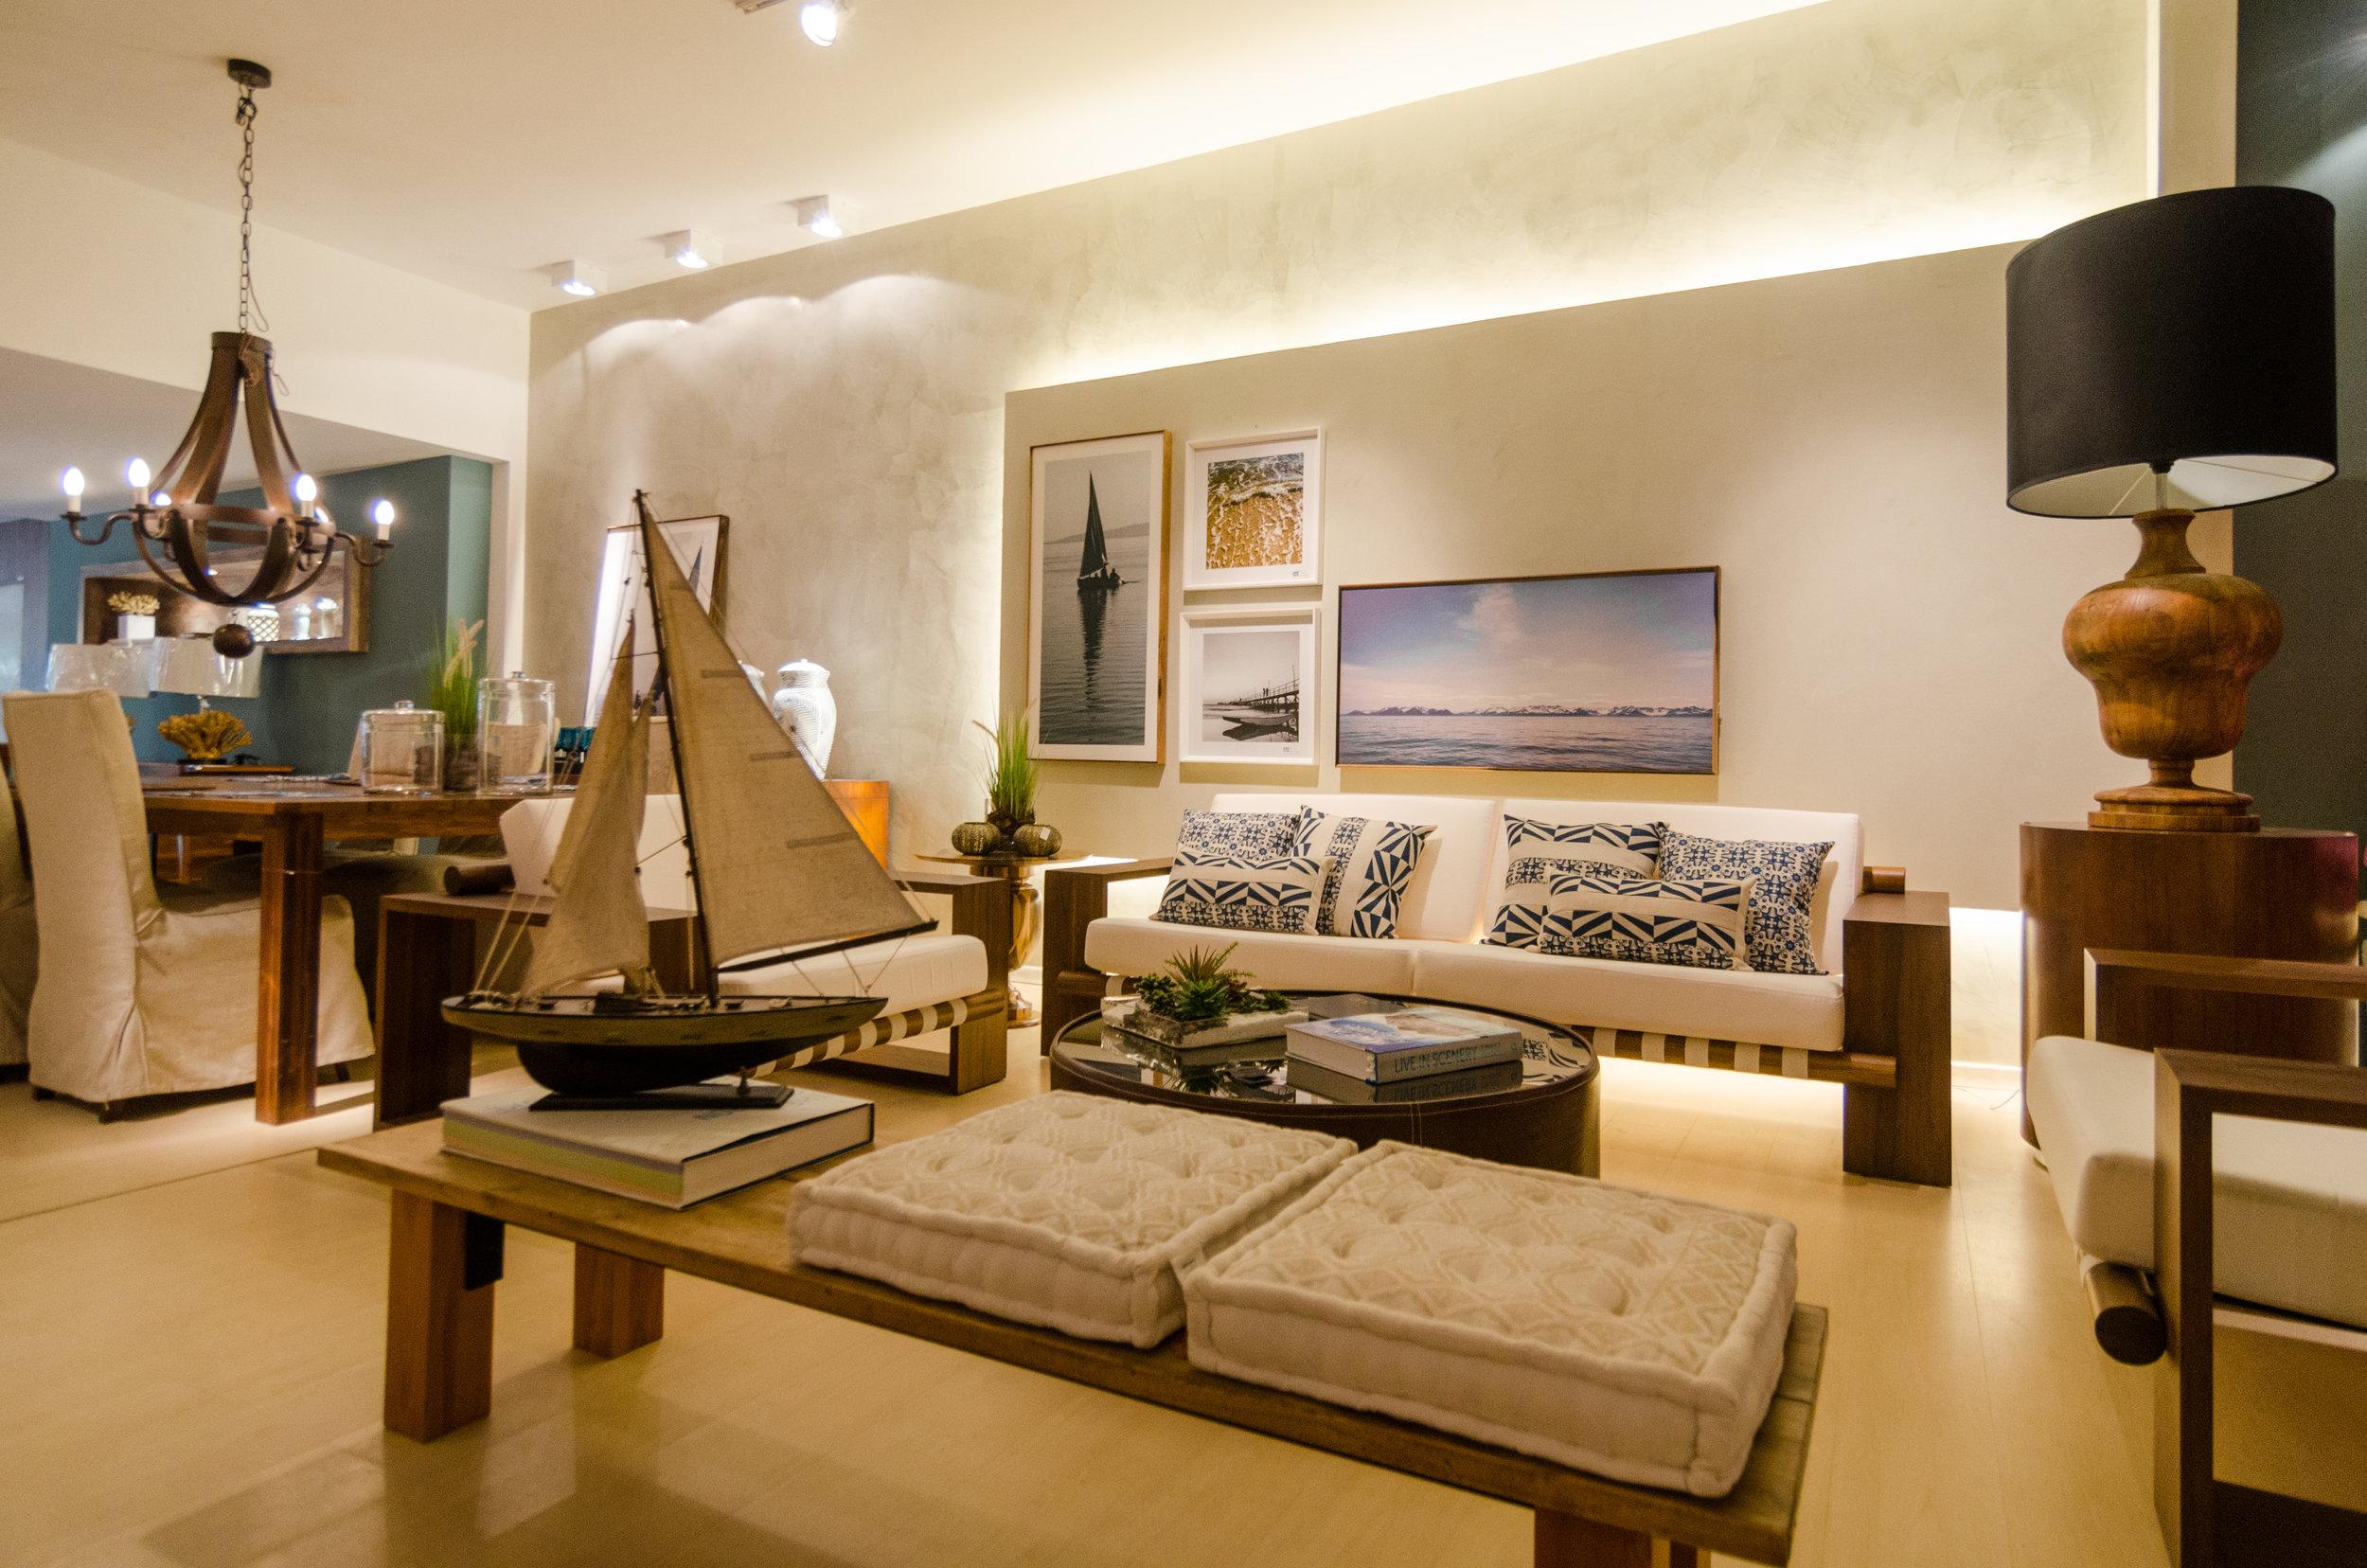 projeto-arquitetonico-mostrasierragarden-duo-arquitetura-mostra-praia-02.jpg